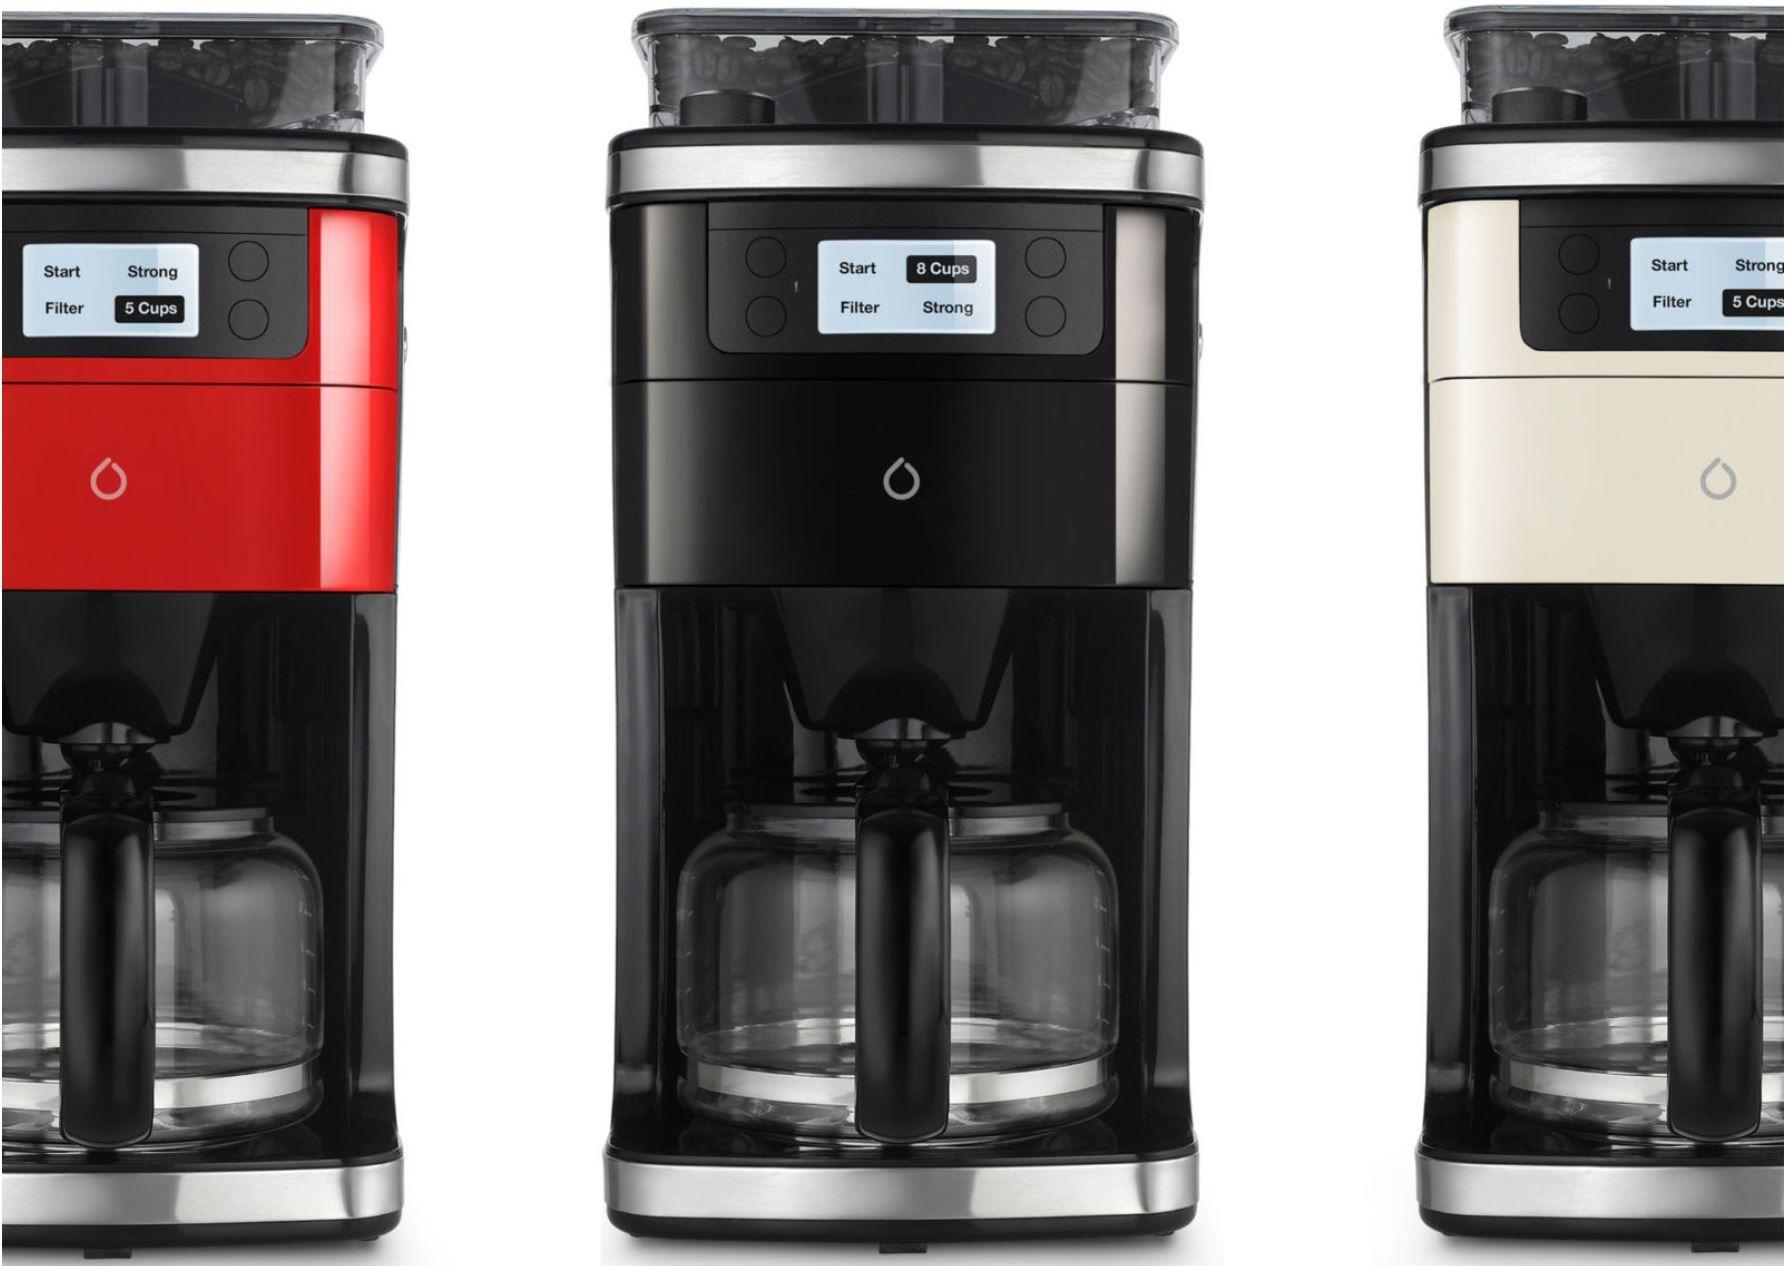 SecondGeneration 'Smarter Coffee' Maker Launches In The